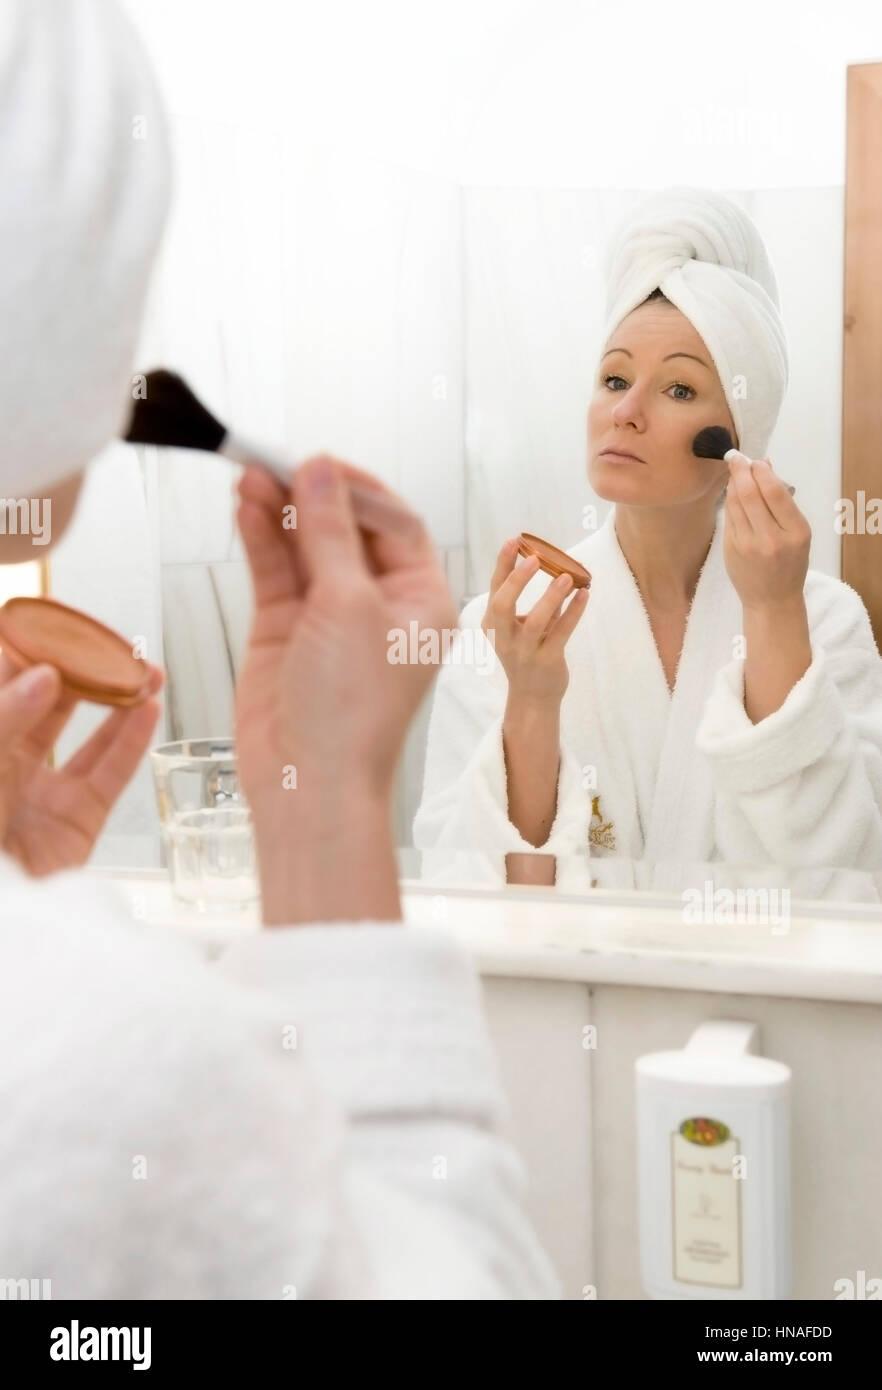 junge frau im badezimmer verwendet wangenrouge - young woman in, Badezimmer ideen